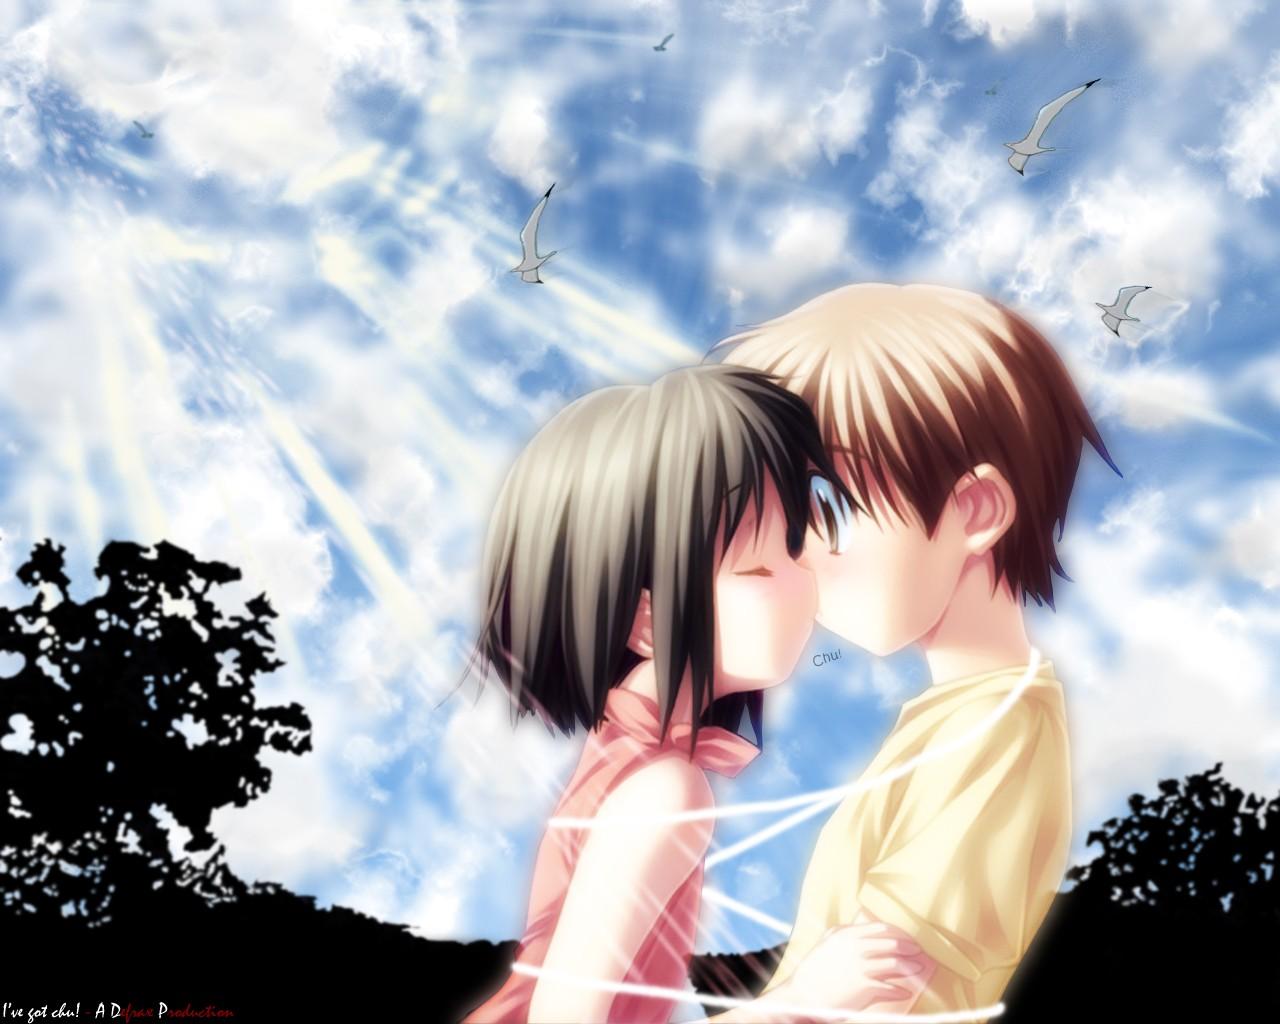 Foro gratis : animes - Portal